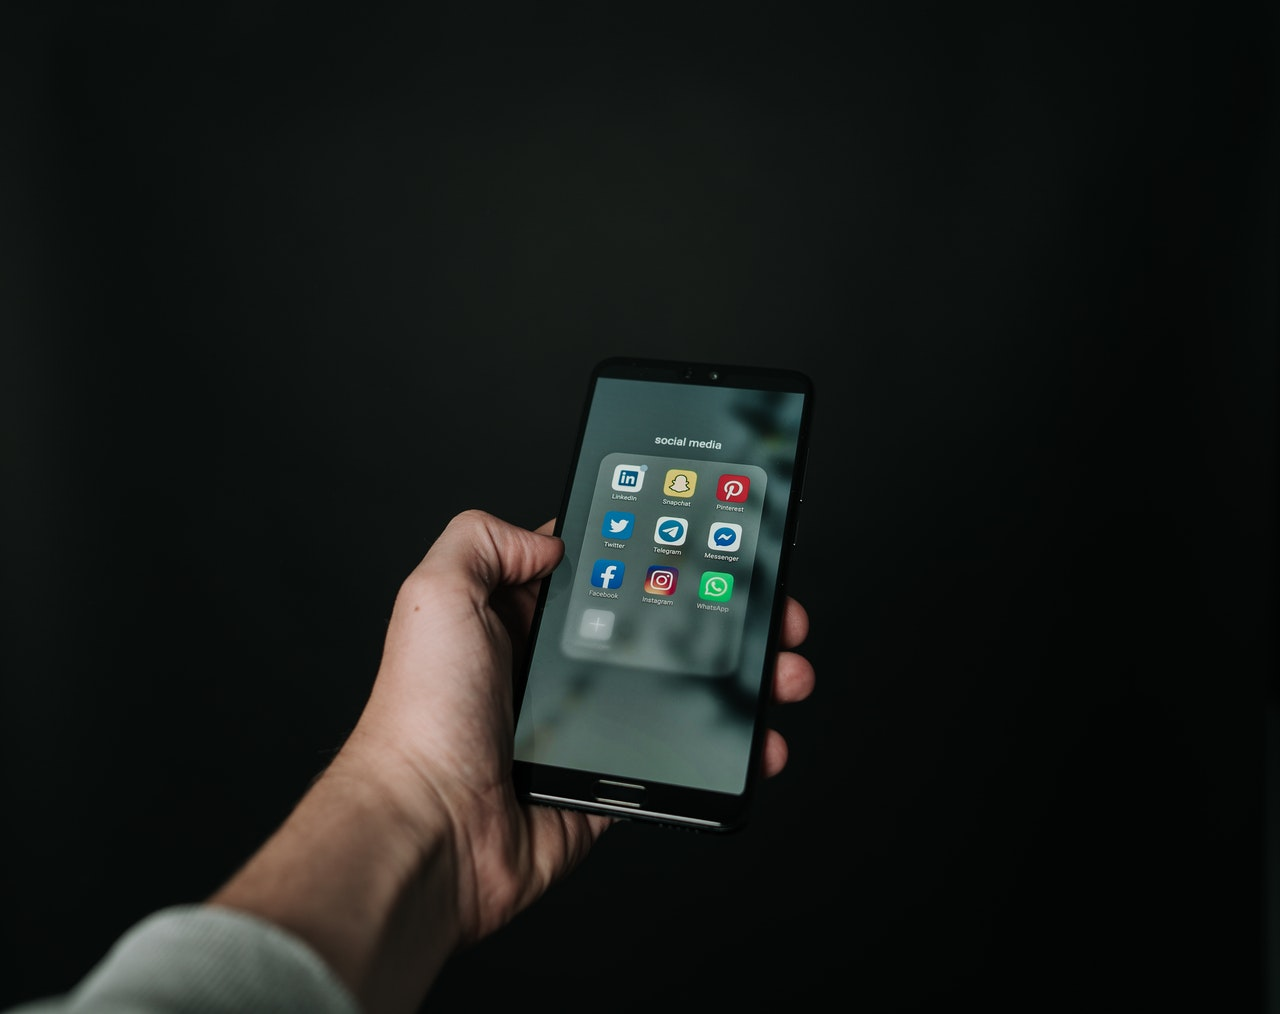 Canadian Employee Background Checks on Social Media